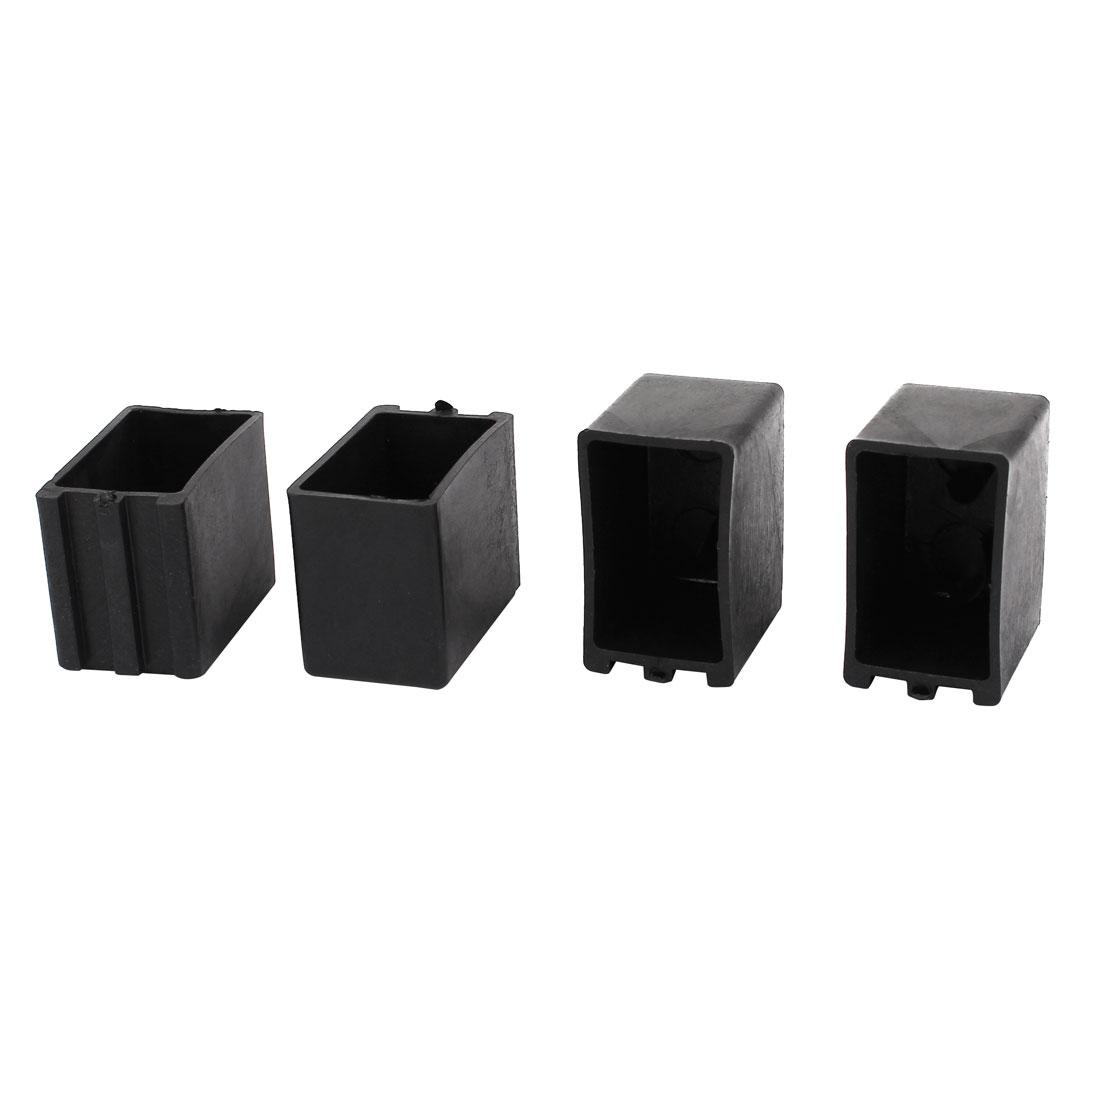 4Pcs Rectangle Shaped Plastic Furniture Foot Leg Corner Protector Pad 25mmx40mm